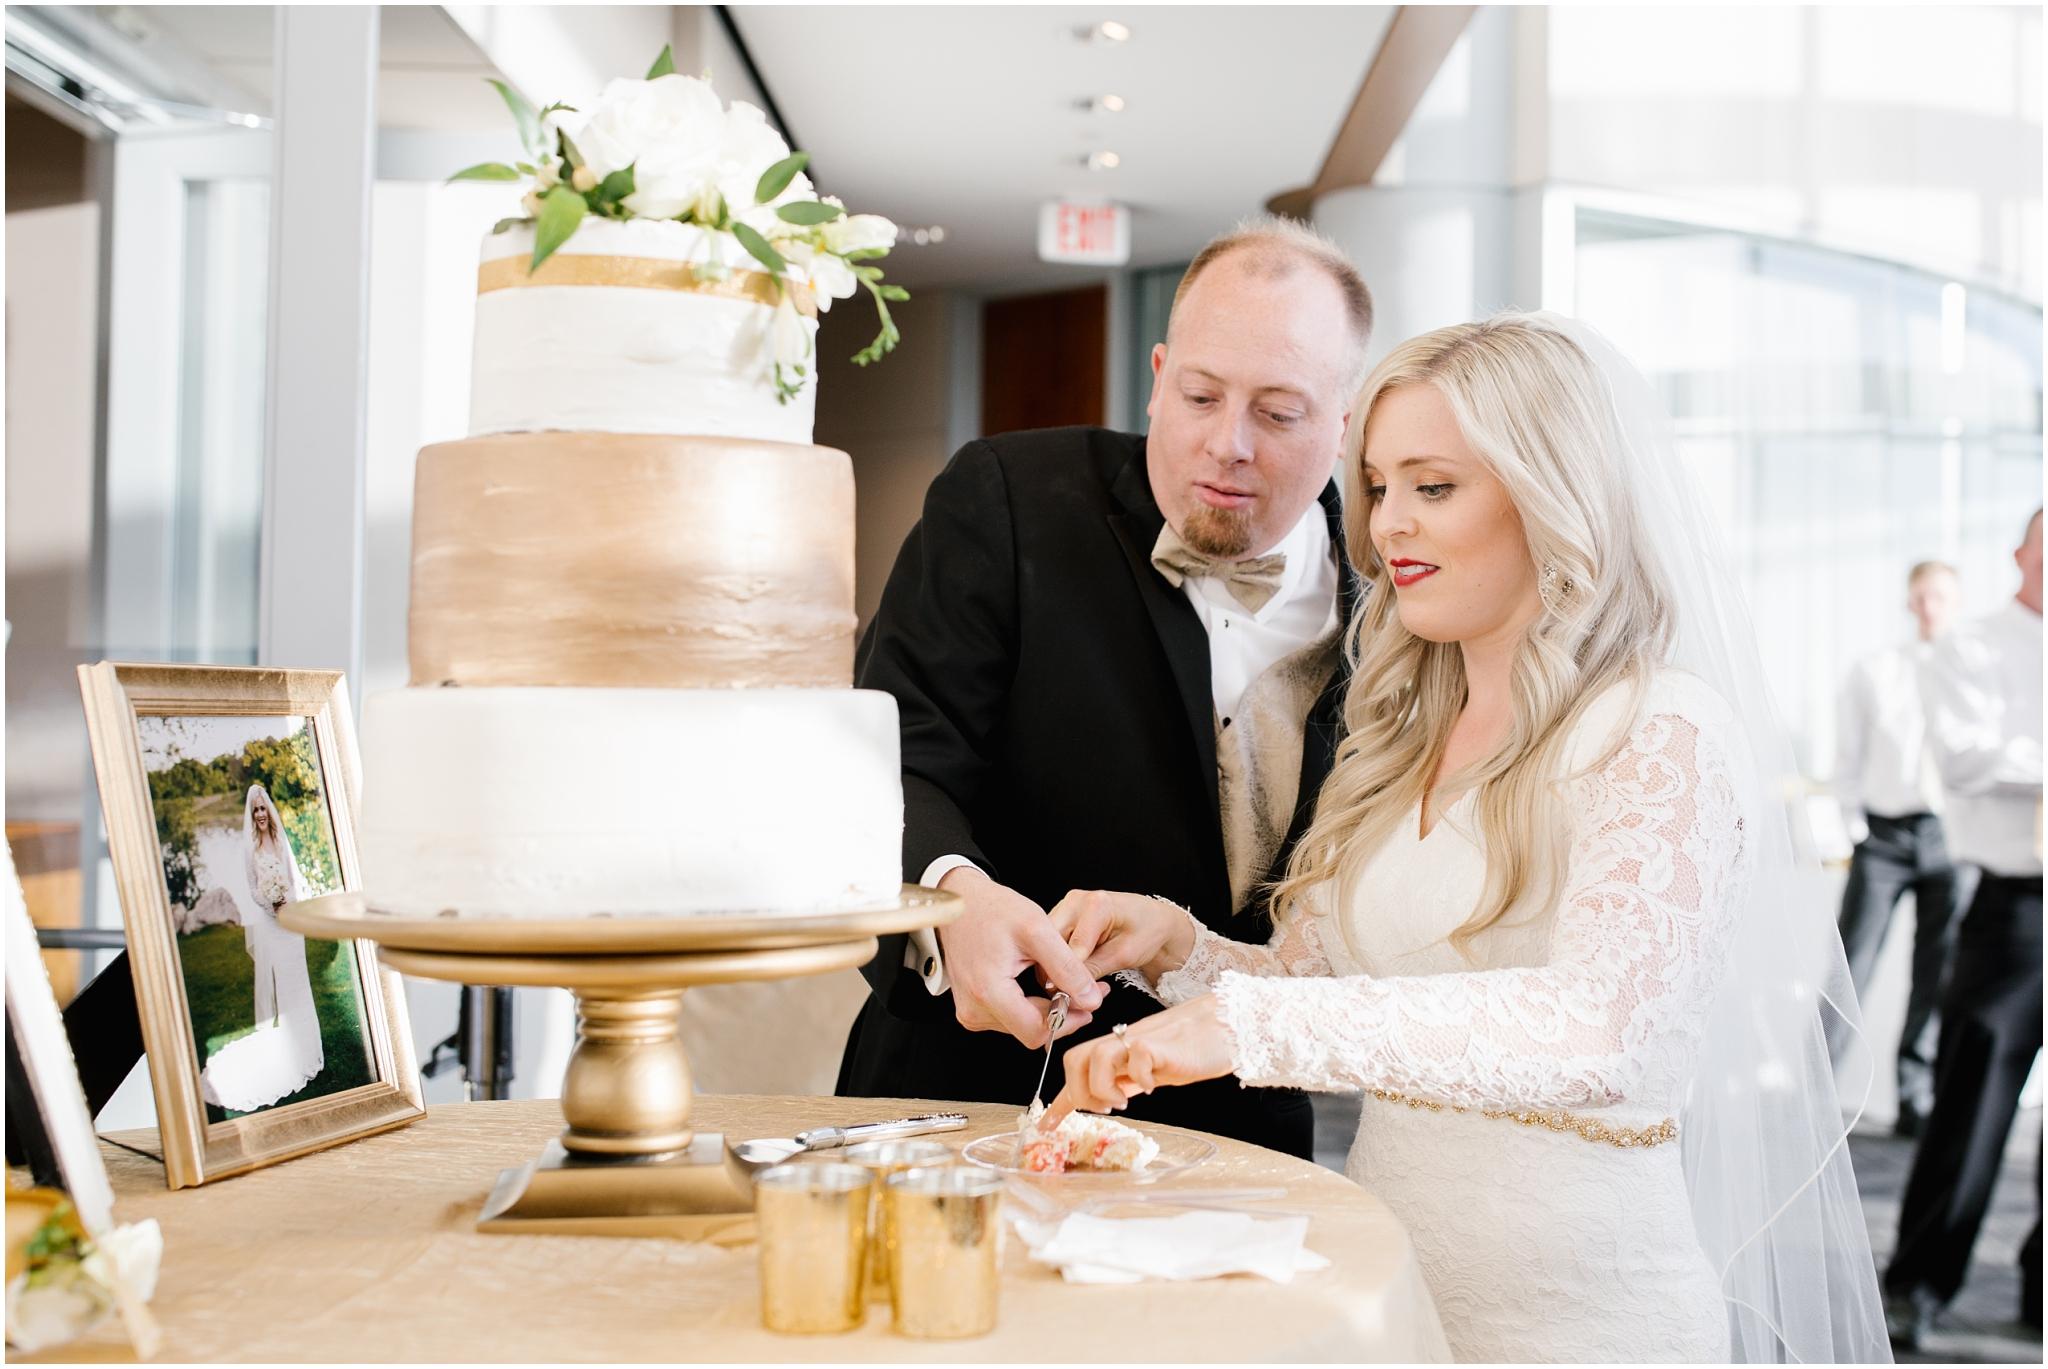 CherylandTyler-519_Lizzie-B-Imagery-Utah-Wedding-Photographer-Salt-Lake-City-Temple-Wells-Fargo-Building-Reception.jpg